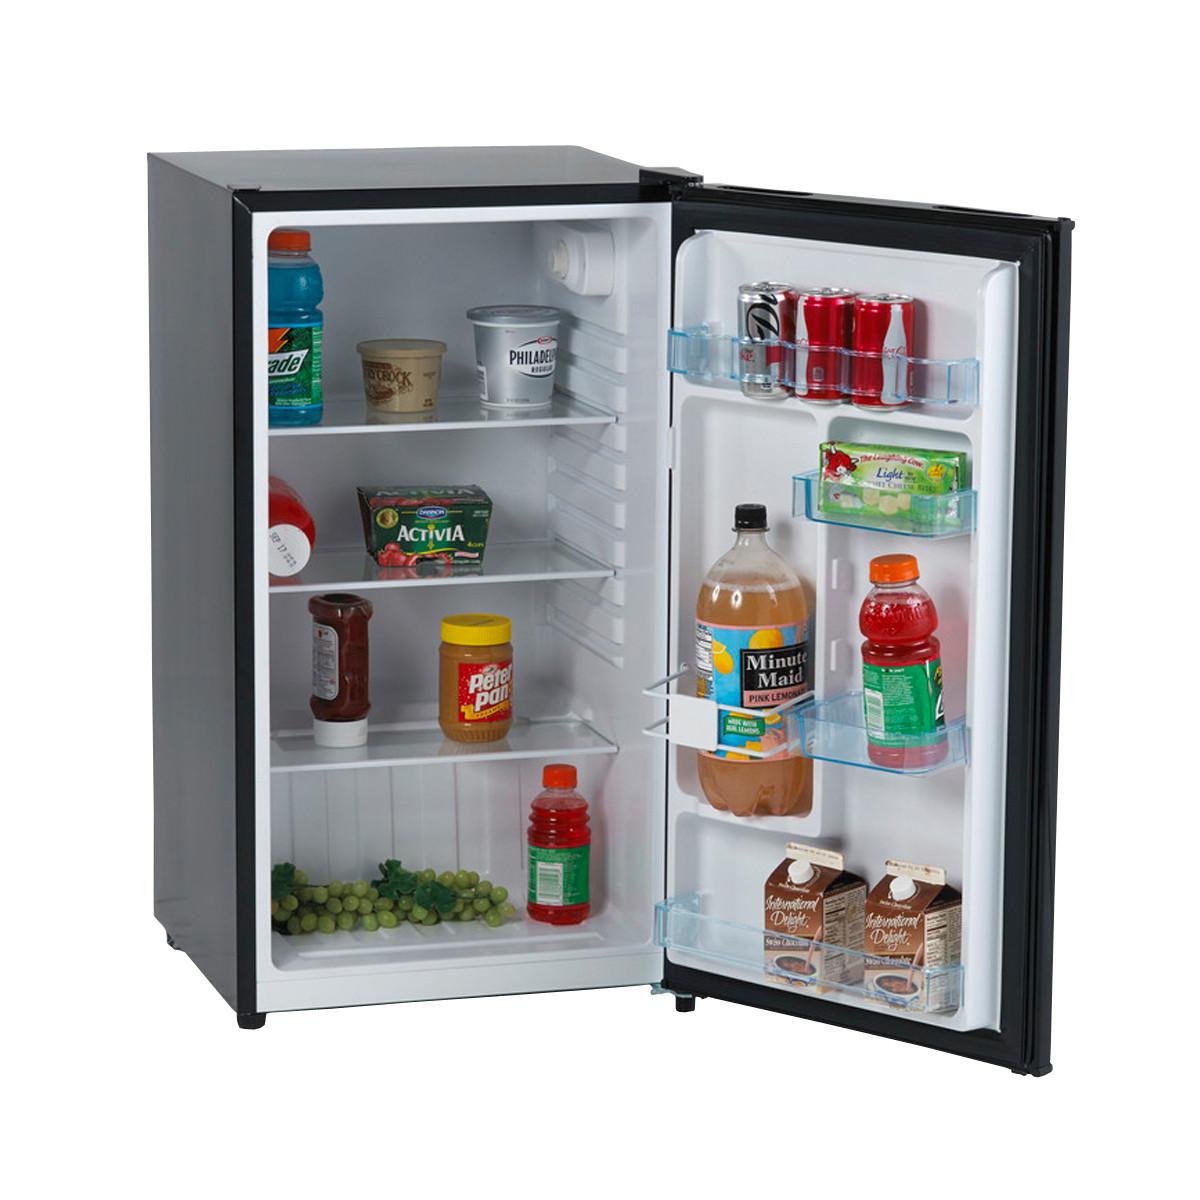 Avanti Refrigerator | 5.5 Cu Ft Refrigerator | Avanti 4.5 Cu Ft Refrigerator